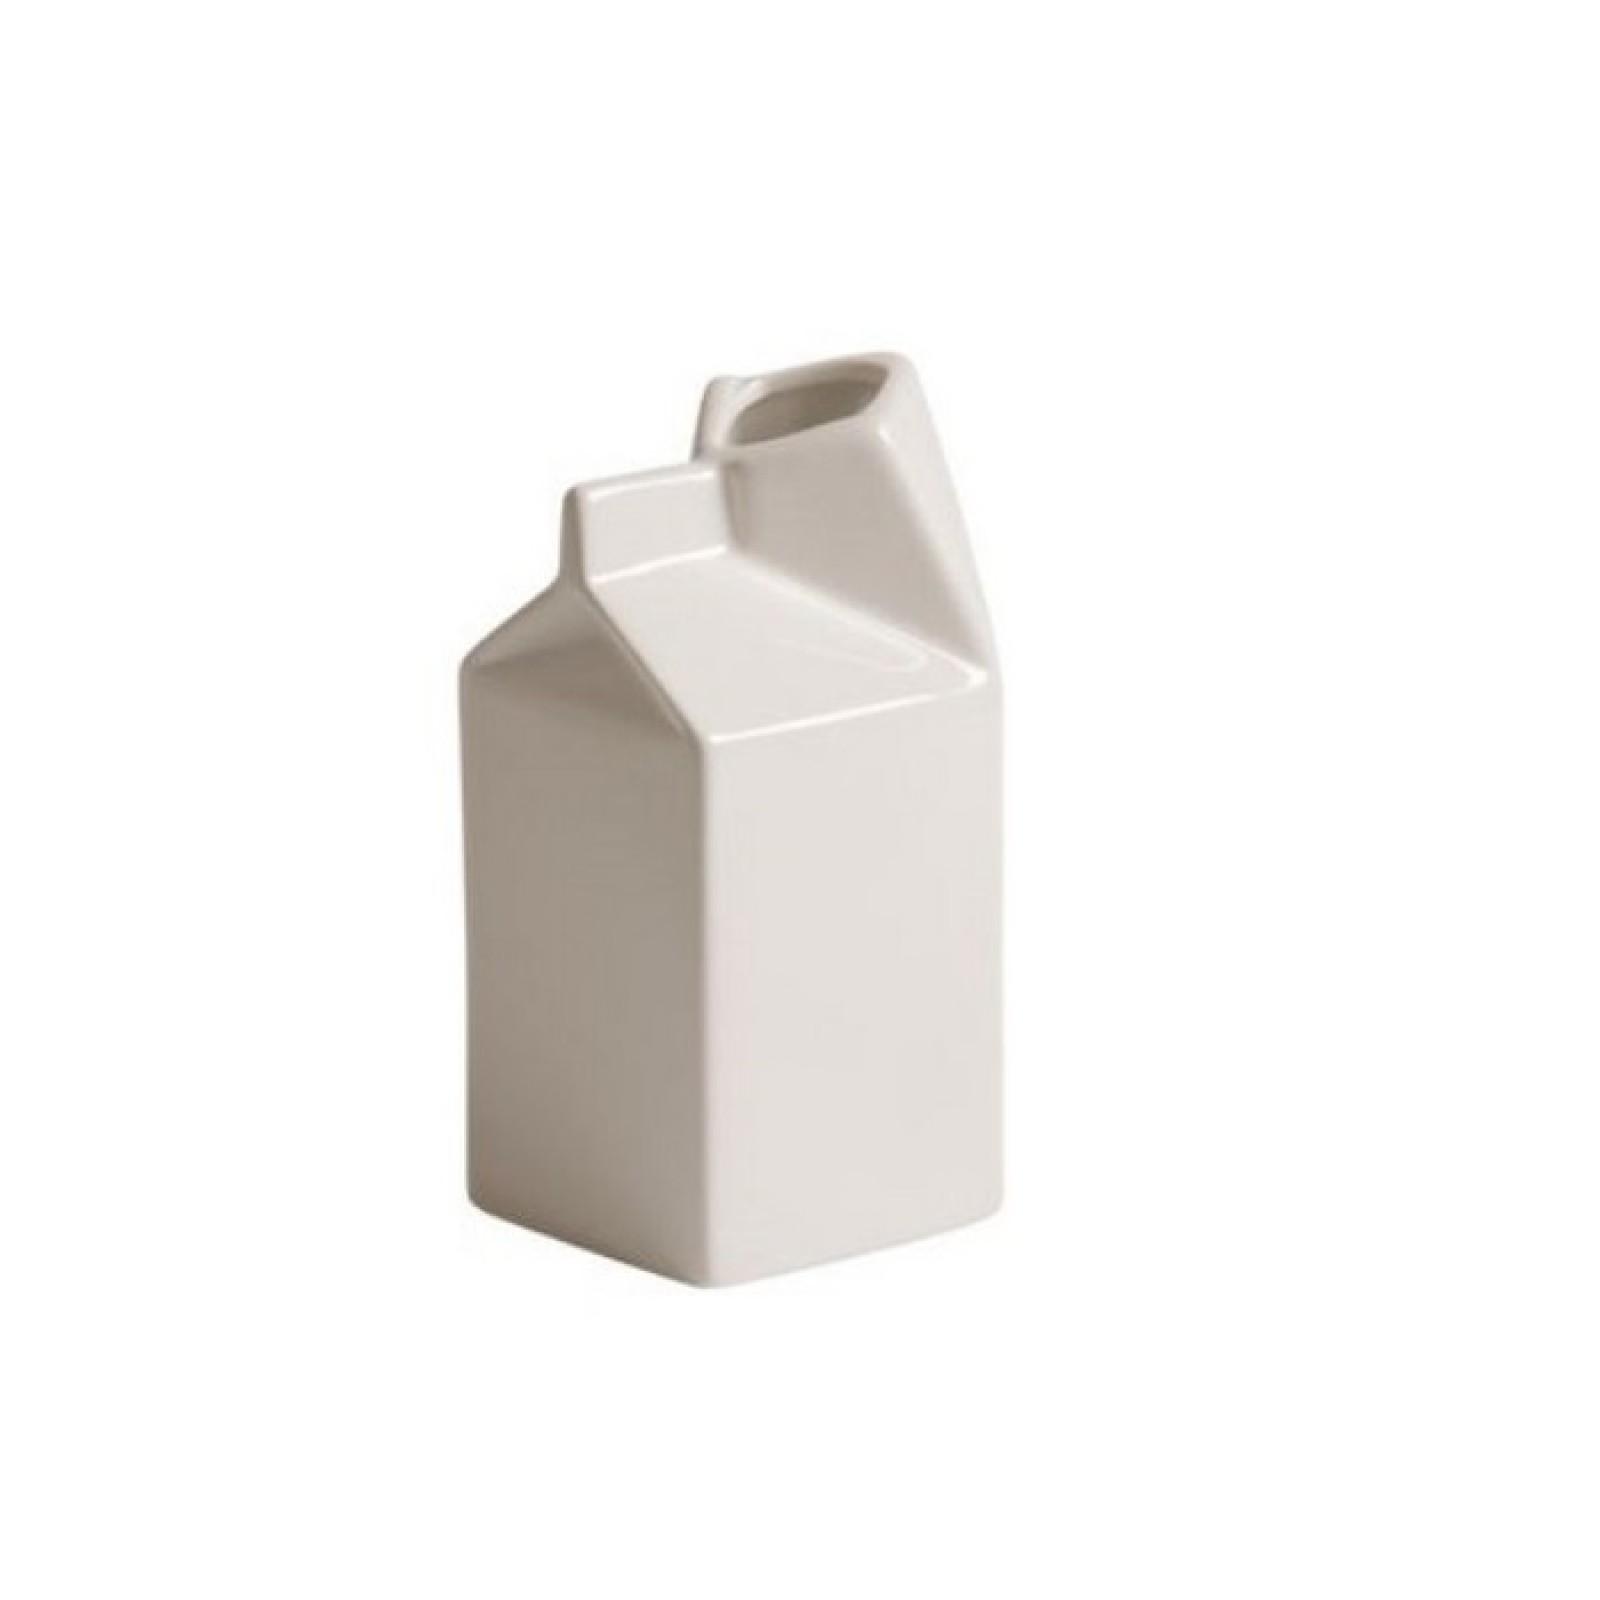 Milk Jug-Vase Estetico Quotidiano - Seletti